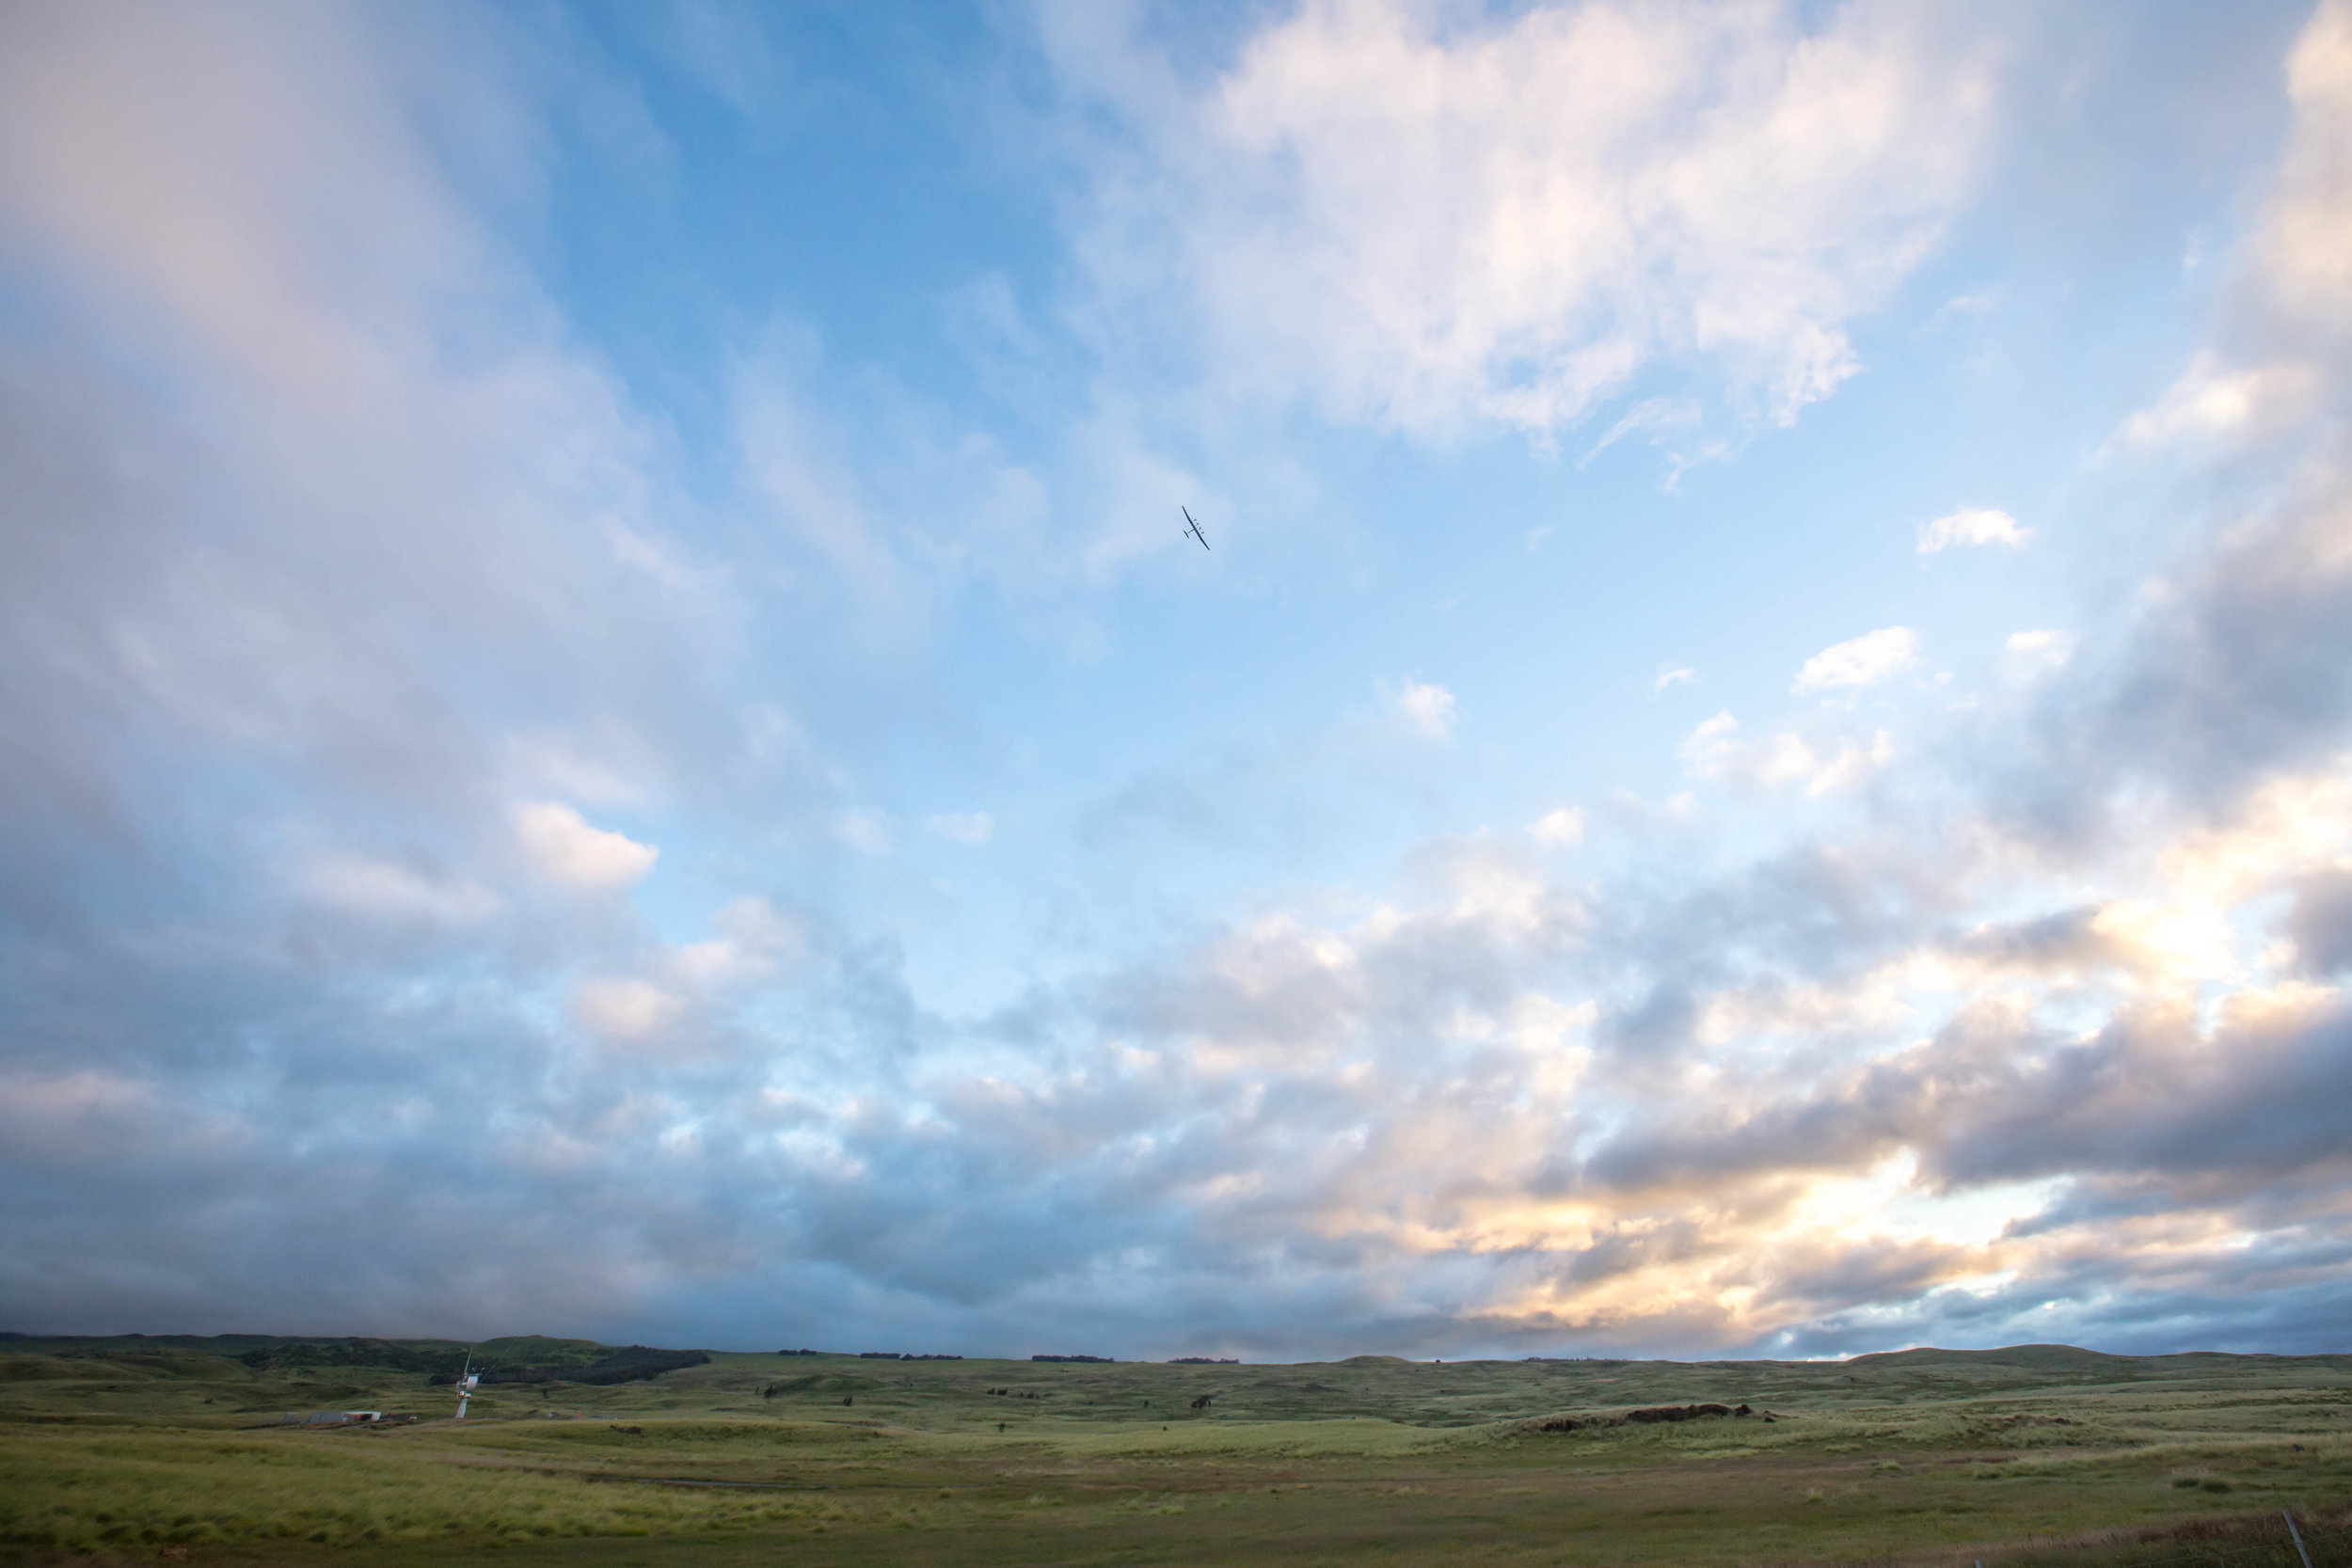 kite in flight hawaii wide.jpg